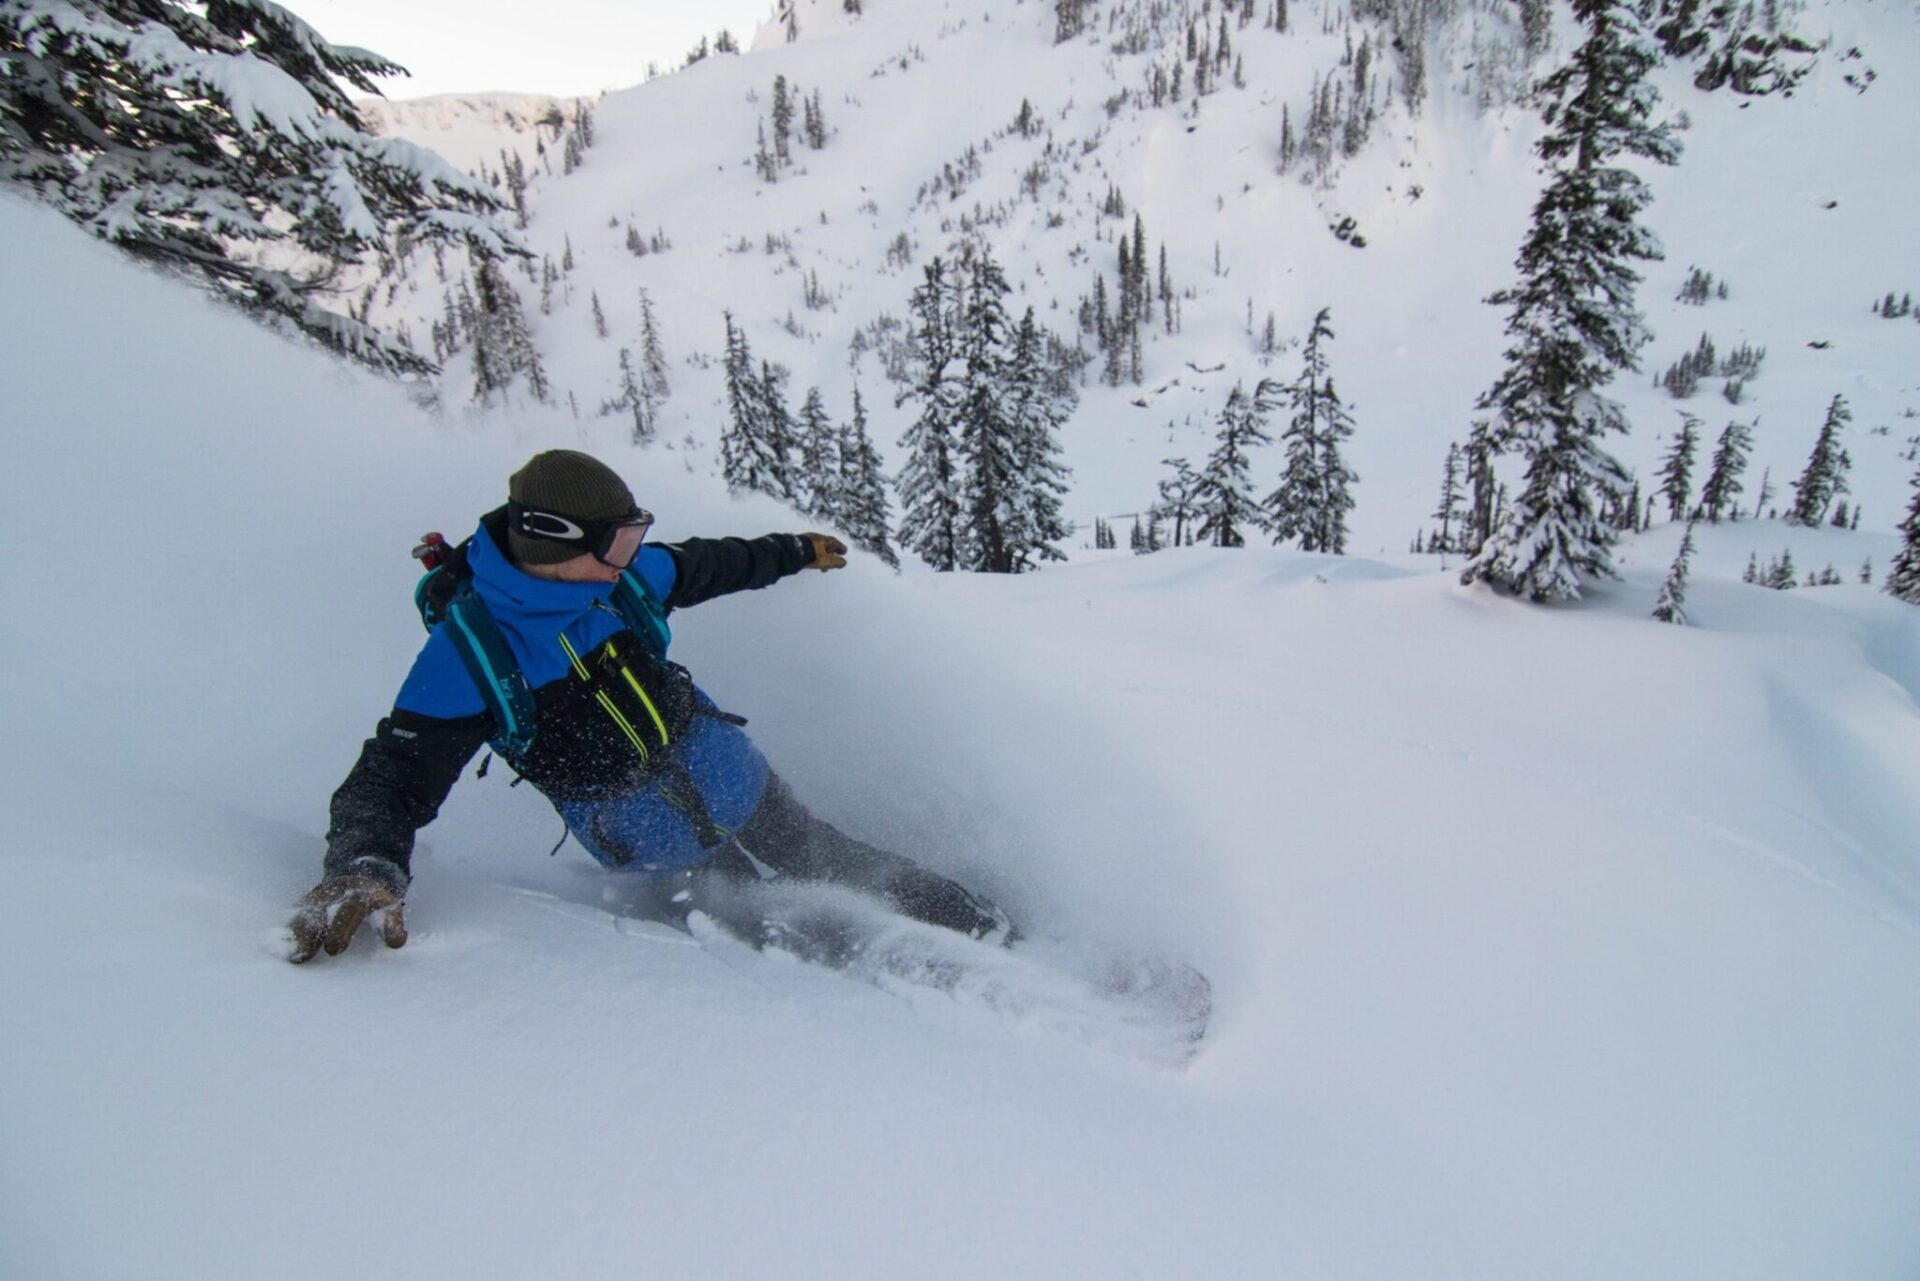 A man snowboarding down a mountain.